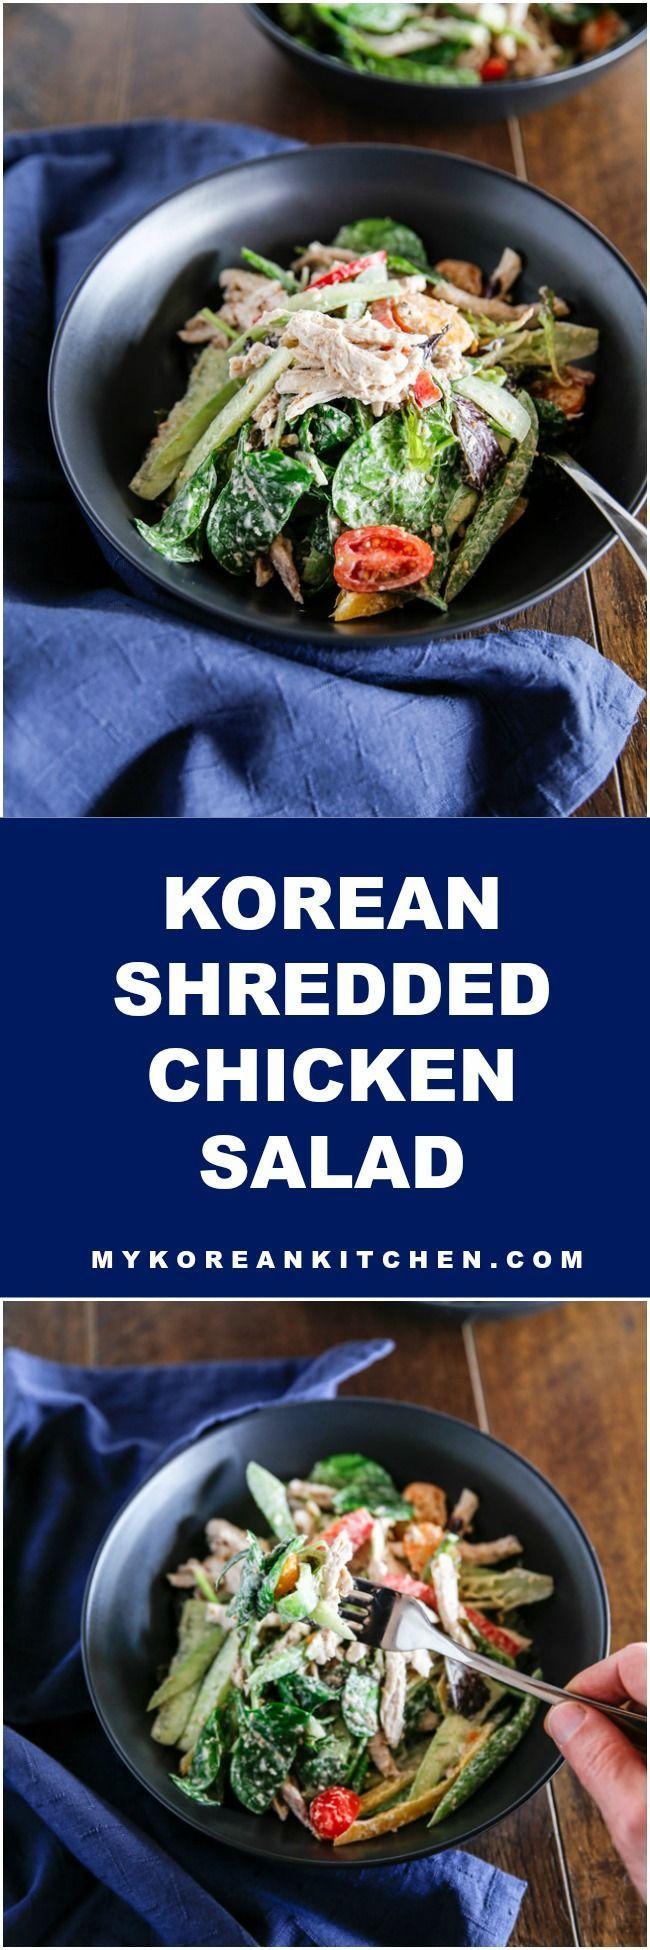 Korean shredded chicken salad with creamy walnut sesame mayo dressing. | MyKoreanKitchen.com